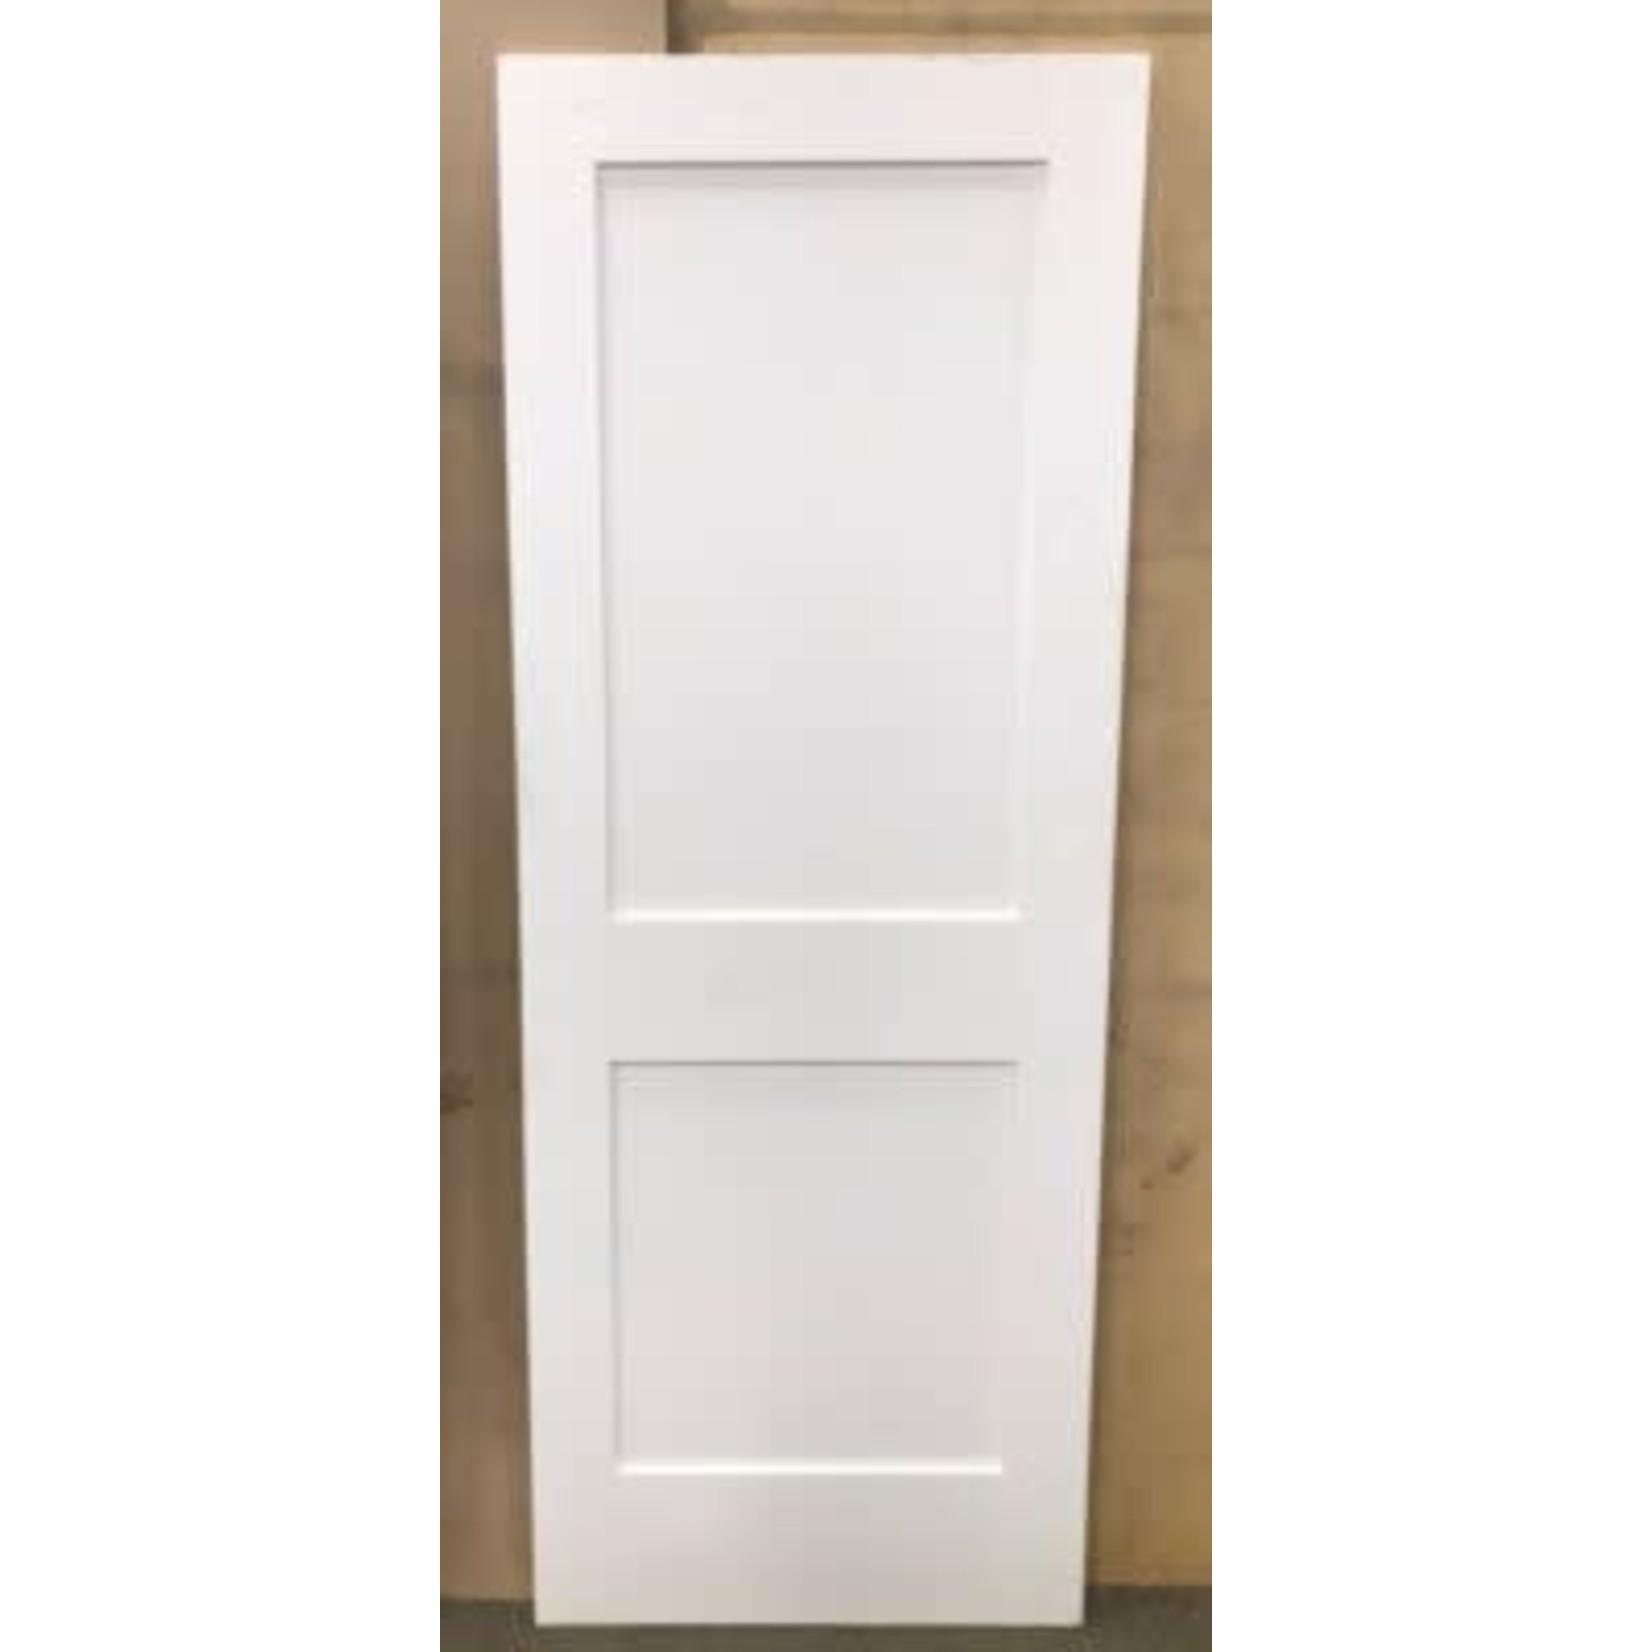 4996 Primed Recessed 2-Panel Interior Door Slab